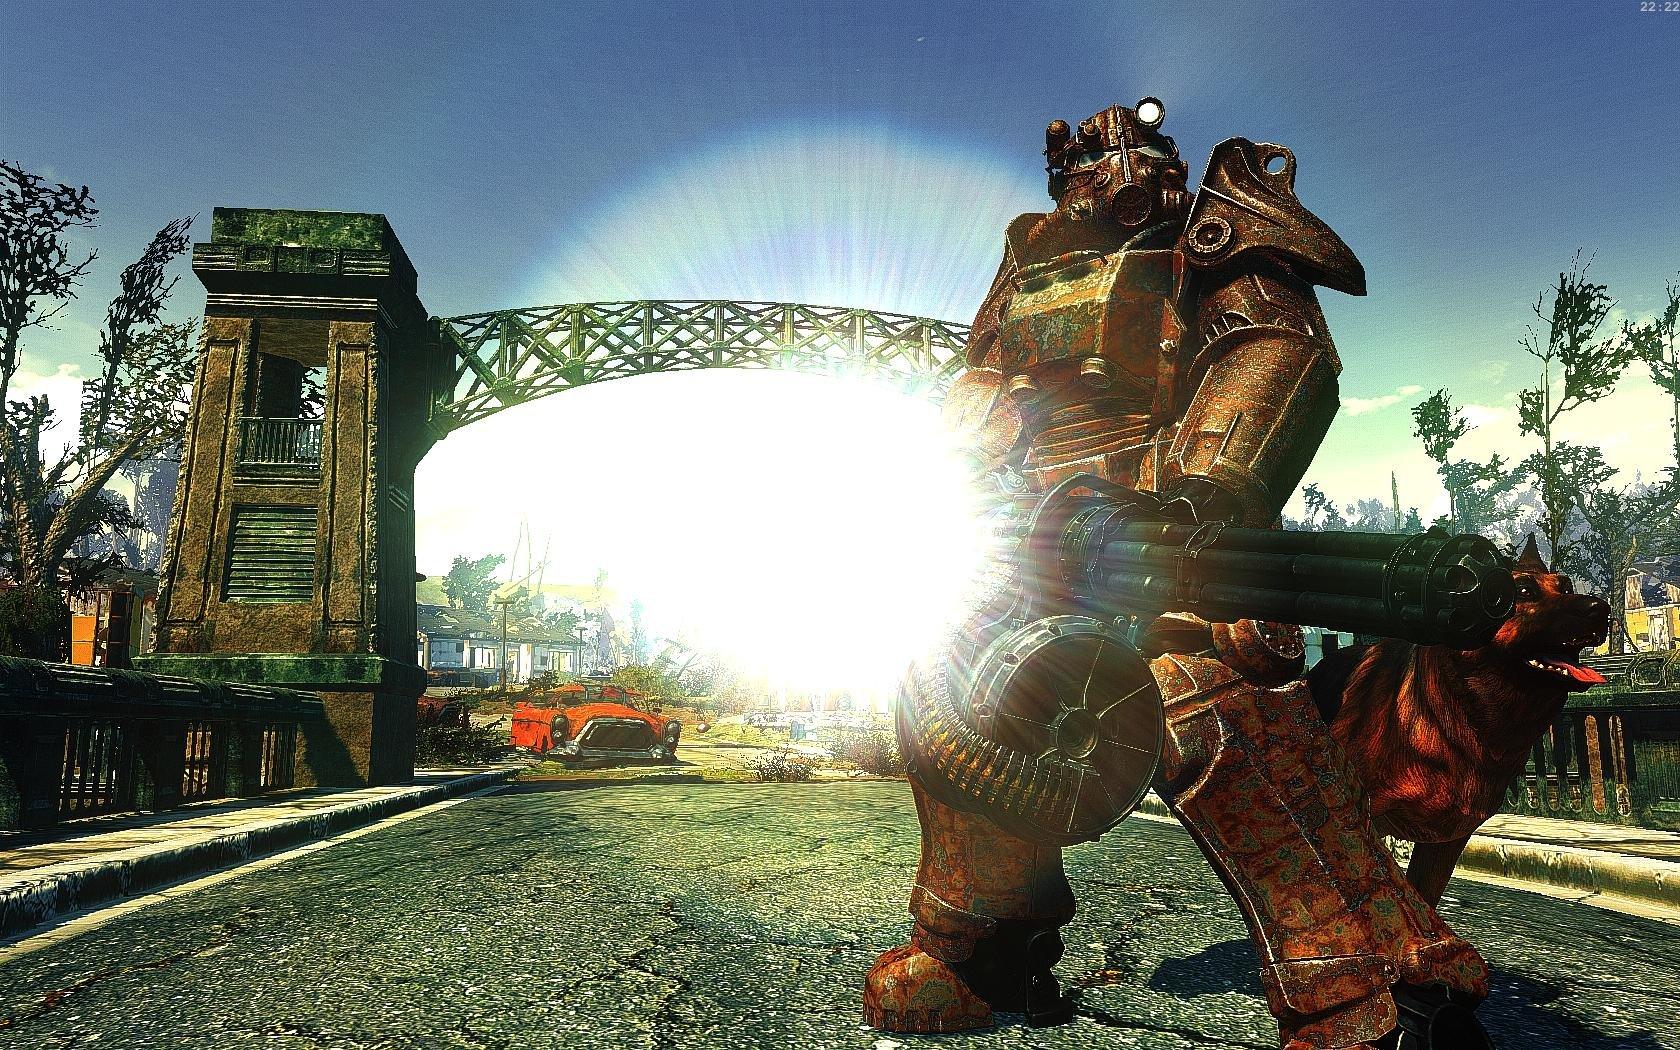 Fallout4 2019-02-19 22-22-12-80